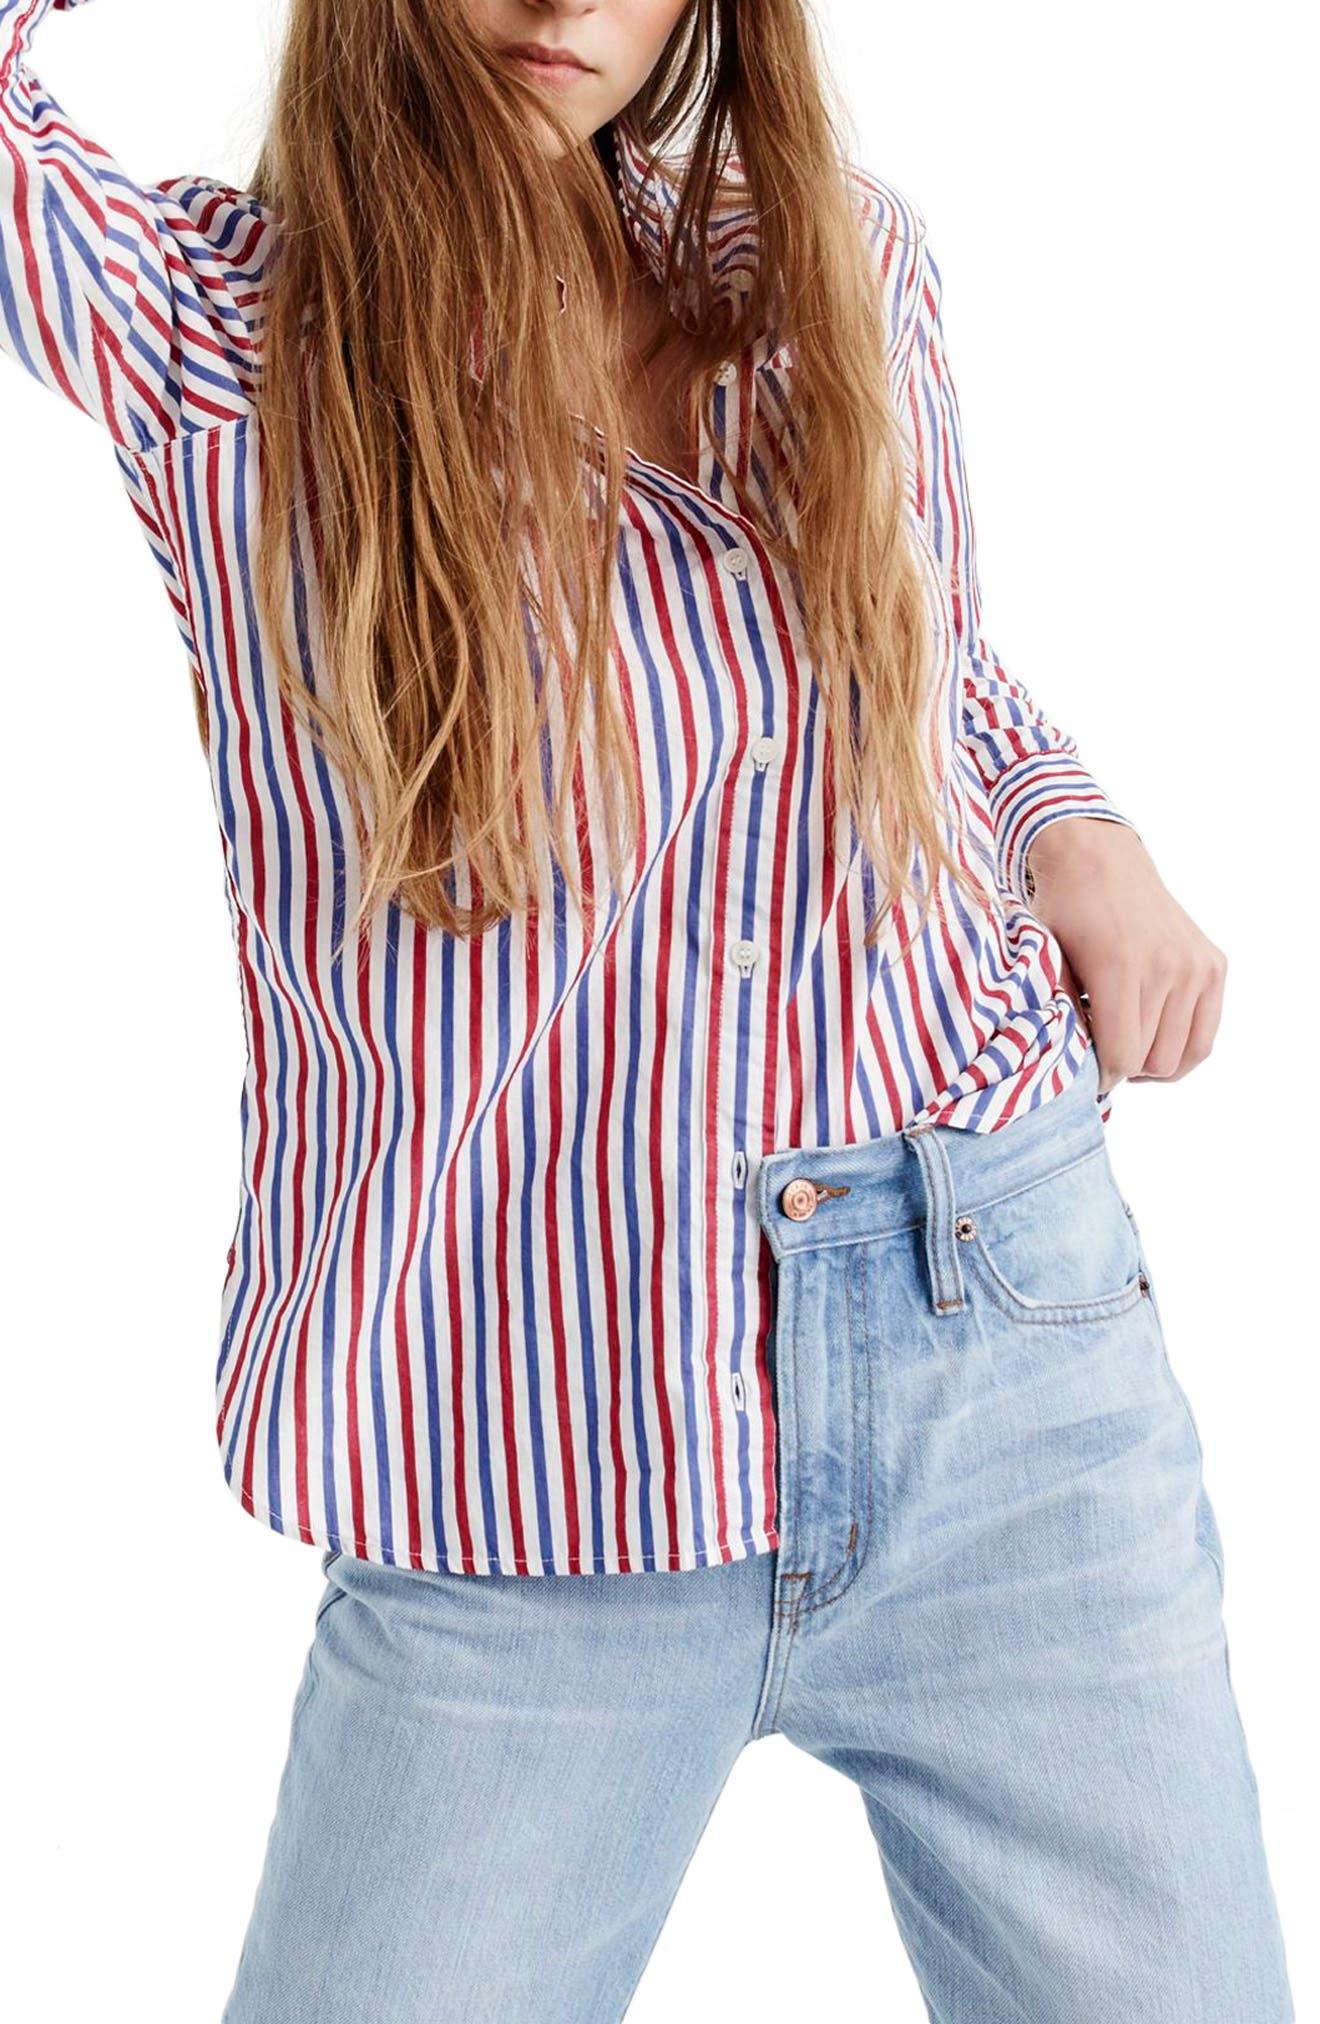 J. Crew Stripe Boyfriend Shirt,                             Main thumbnail 1, color,                             600